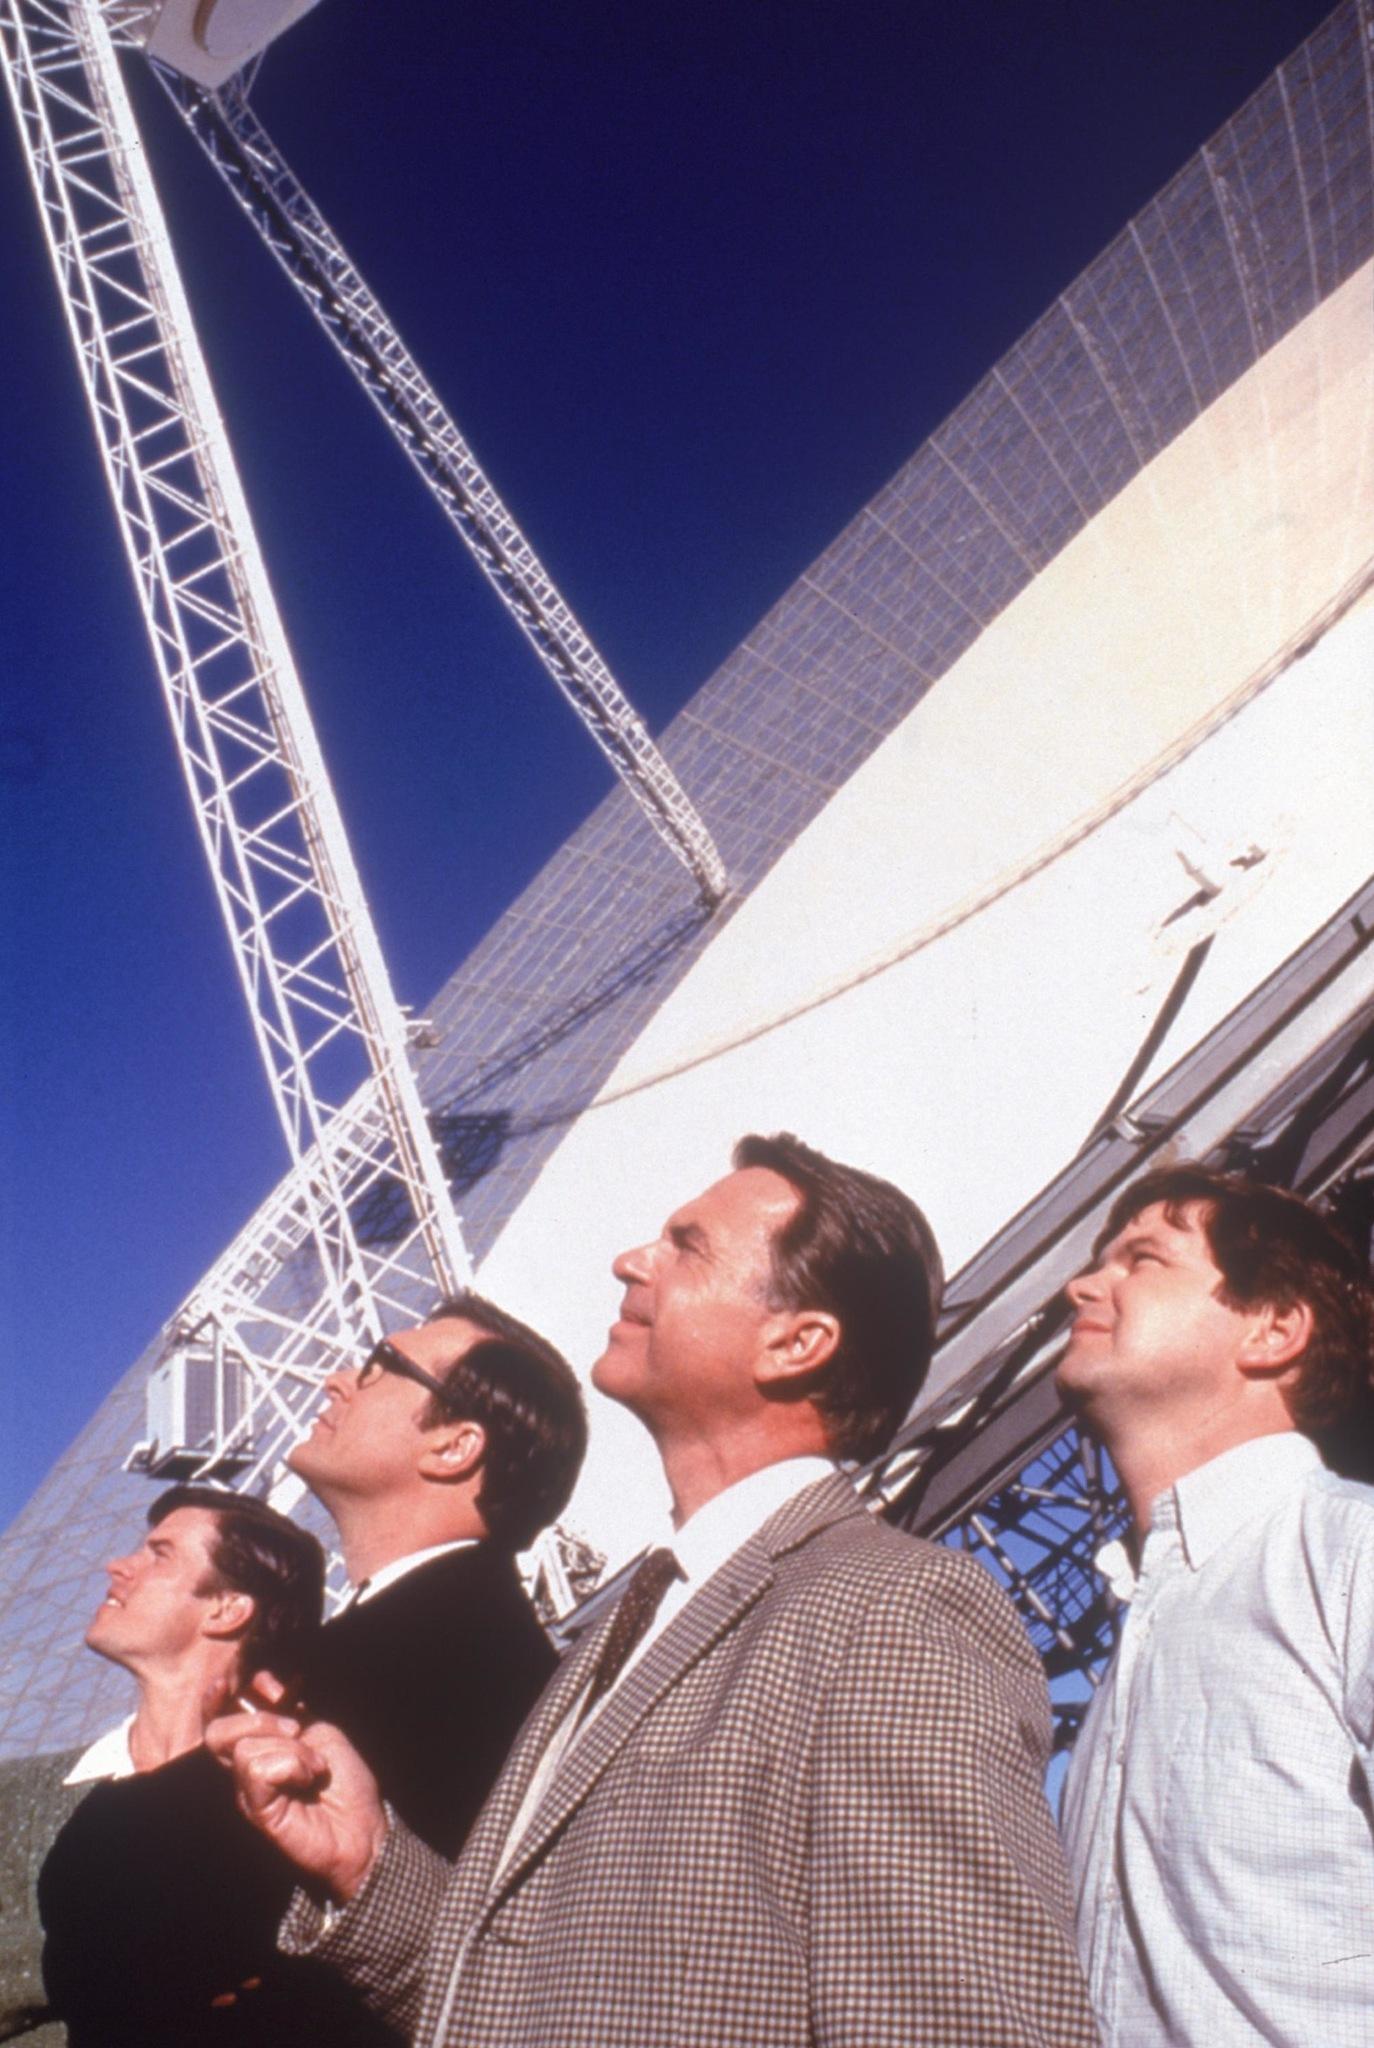 Sam Neill, Kevin Harrington, Tom Long, and Patrick Warburton in The Dish (2000)